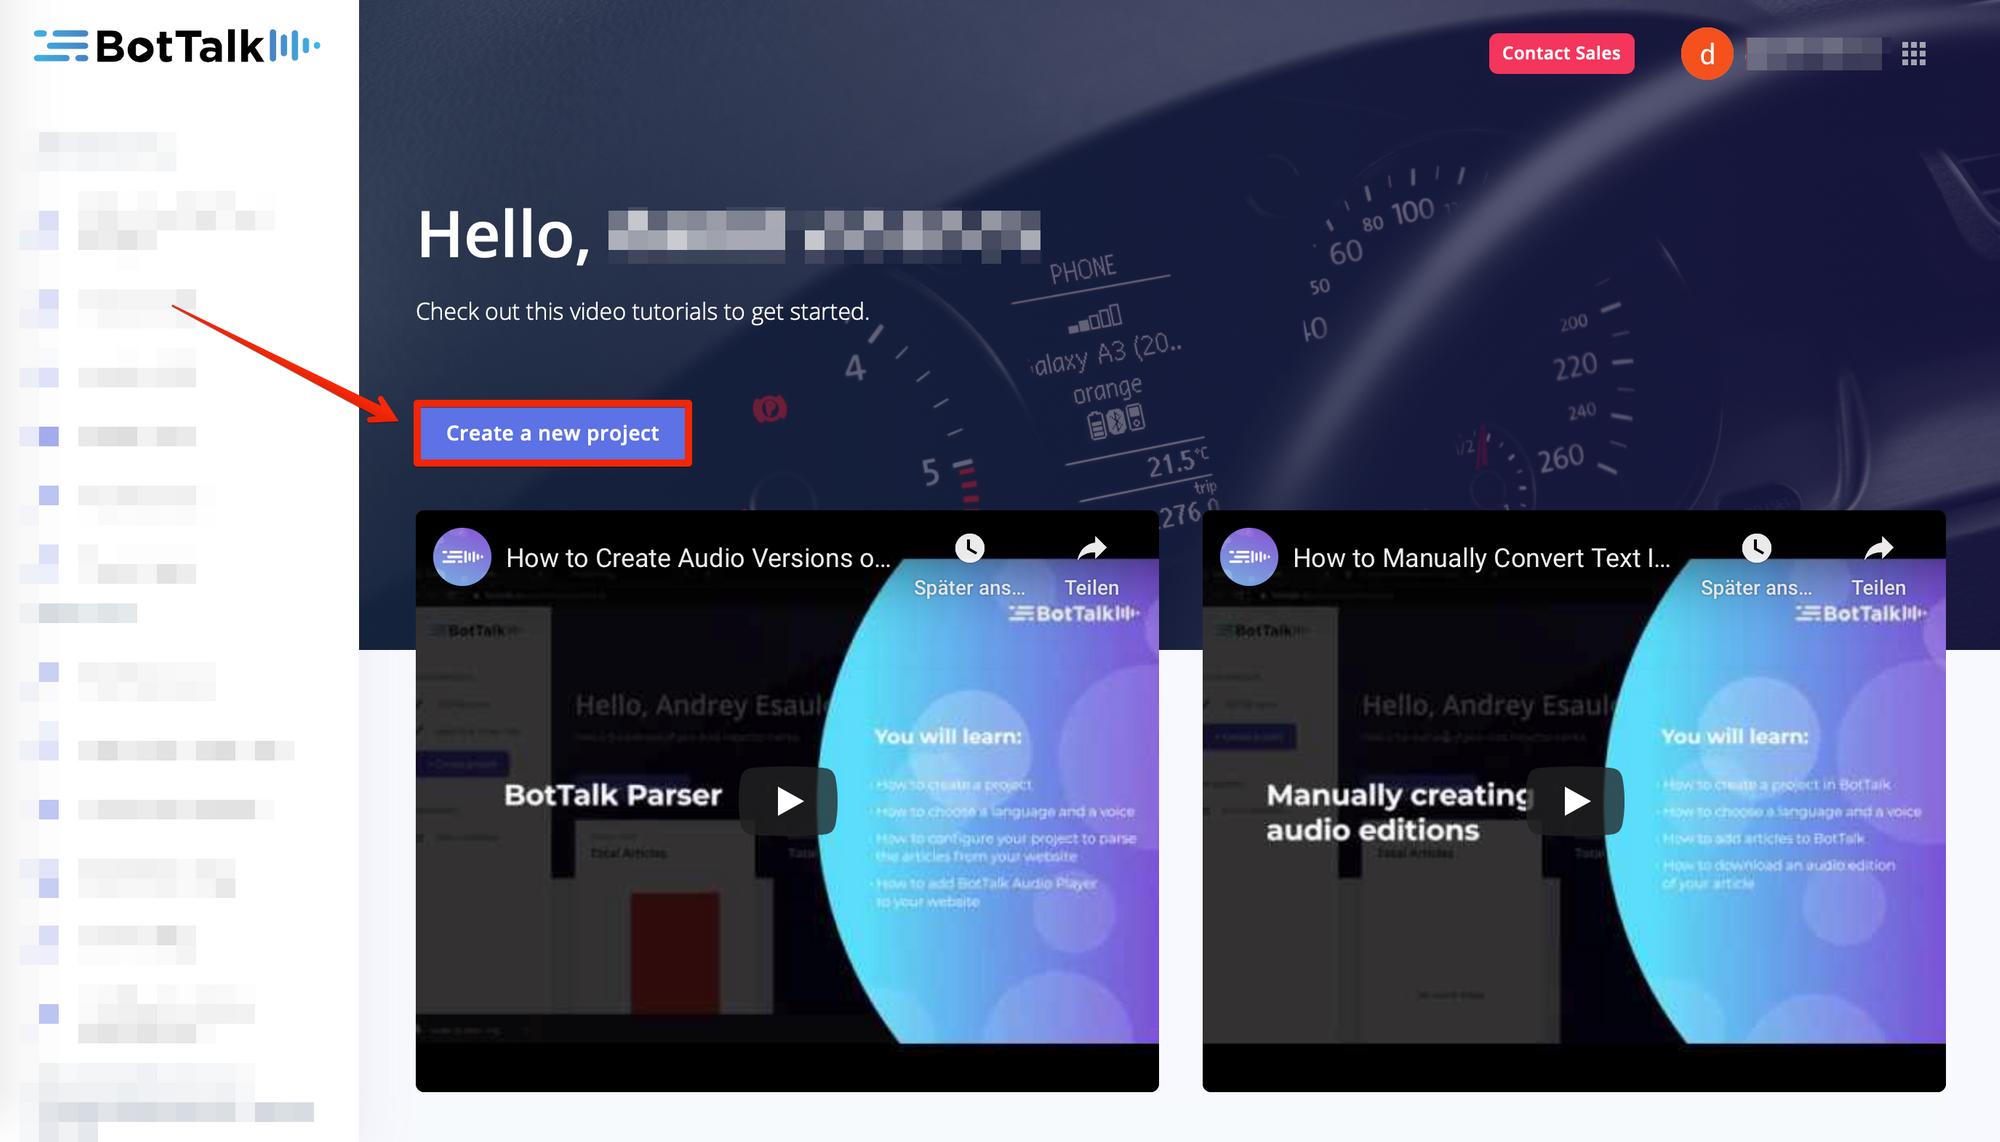 BotTalk-homepage-TTSprovider